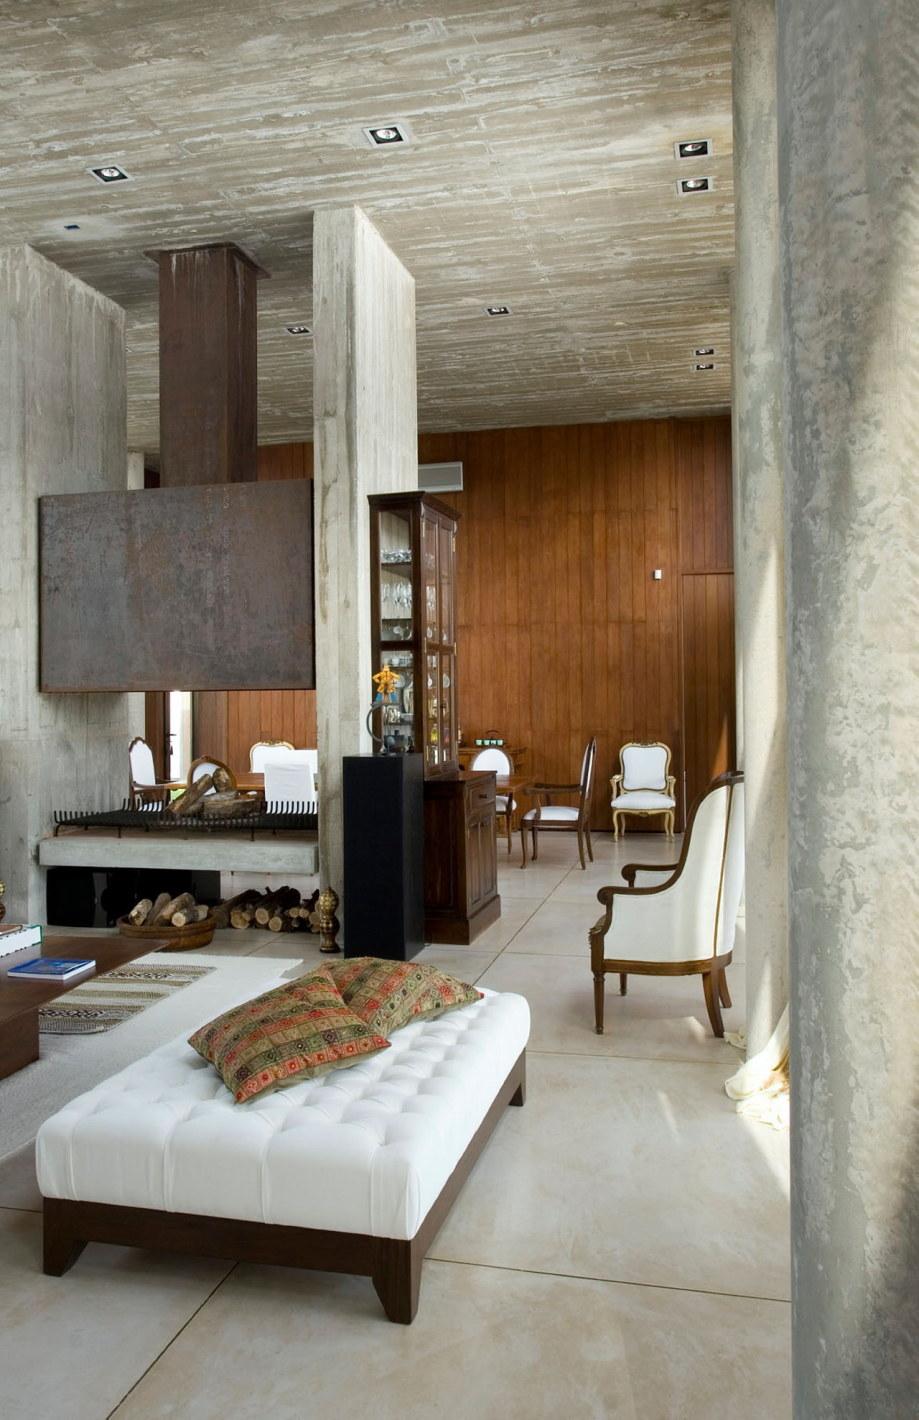 The beach house La Boyita Residence by Martin Gomez Arguitectos, Uruguay 19